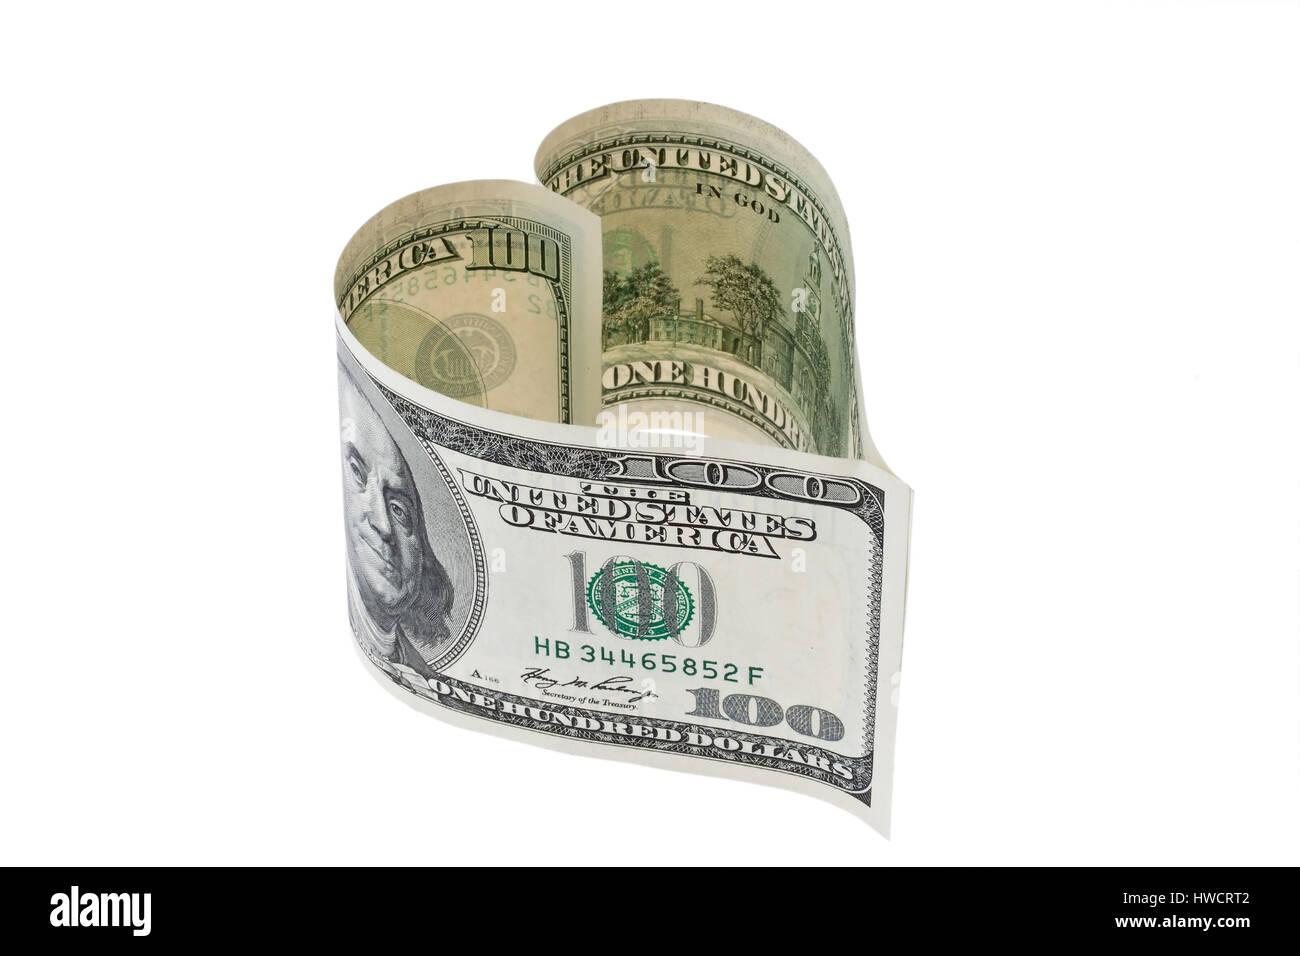 100 dollars of bank note in heart form, 100 Dollar Geldschein in Herzform - Stock Image